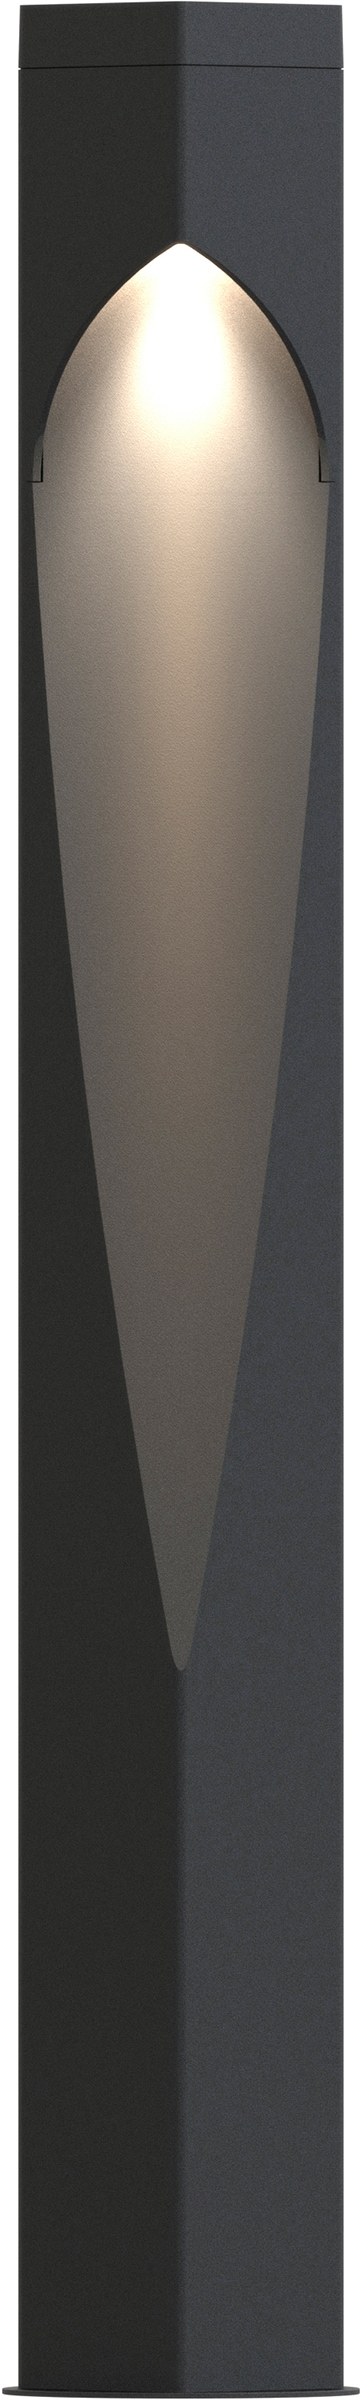 Nordlux Pollerleuchte CONCOR, GU10